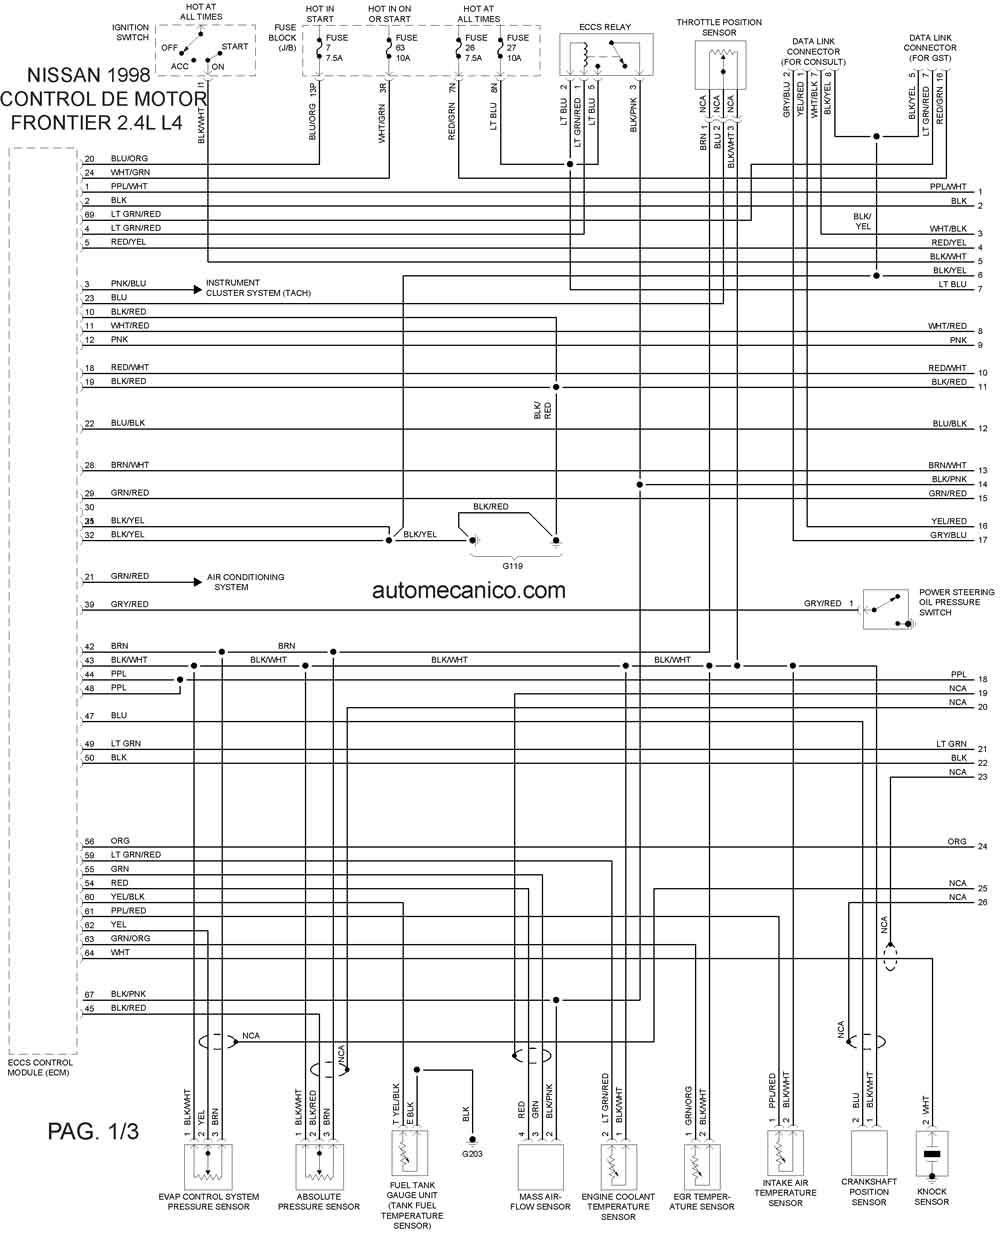 Wiring Diagram For Nissan Pulsar N16 : Nissan pulsar n stereo wiring diagram pathfinder